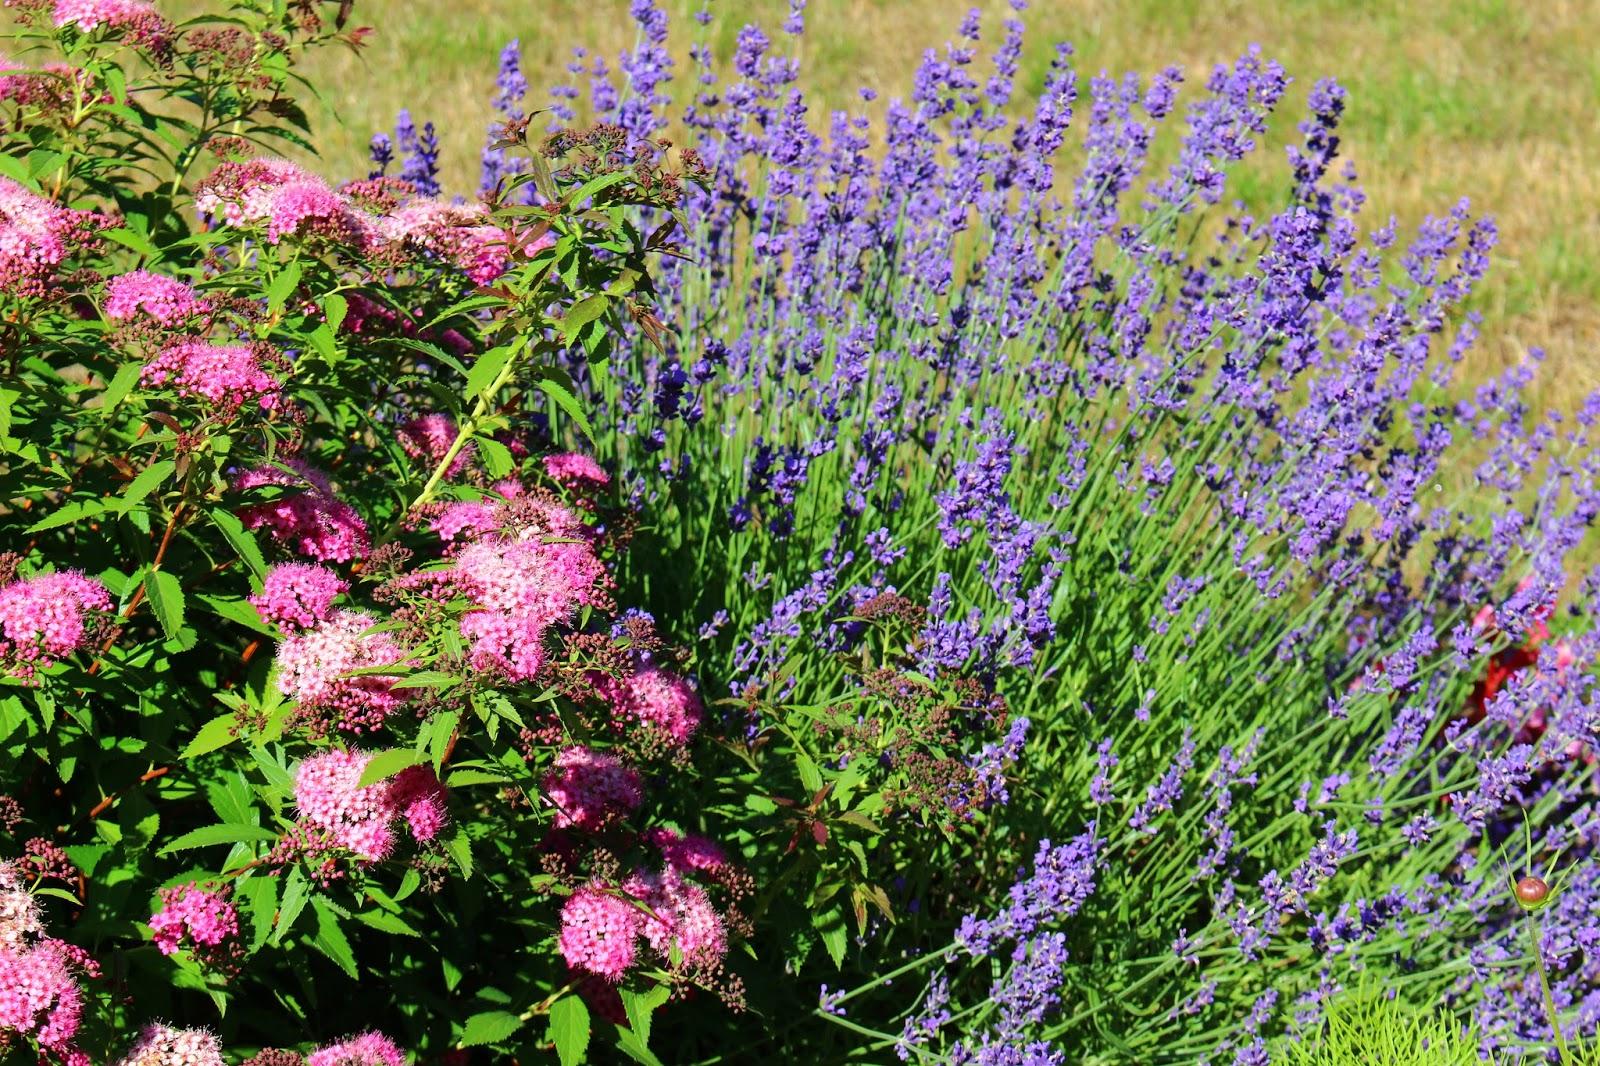 Roses du jardin ch neland spiraea japonica shirobana - Quand tailler les lavandes ...